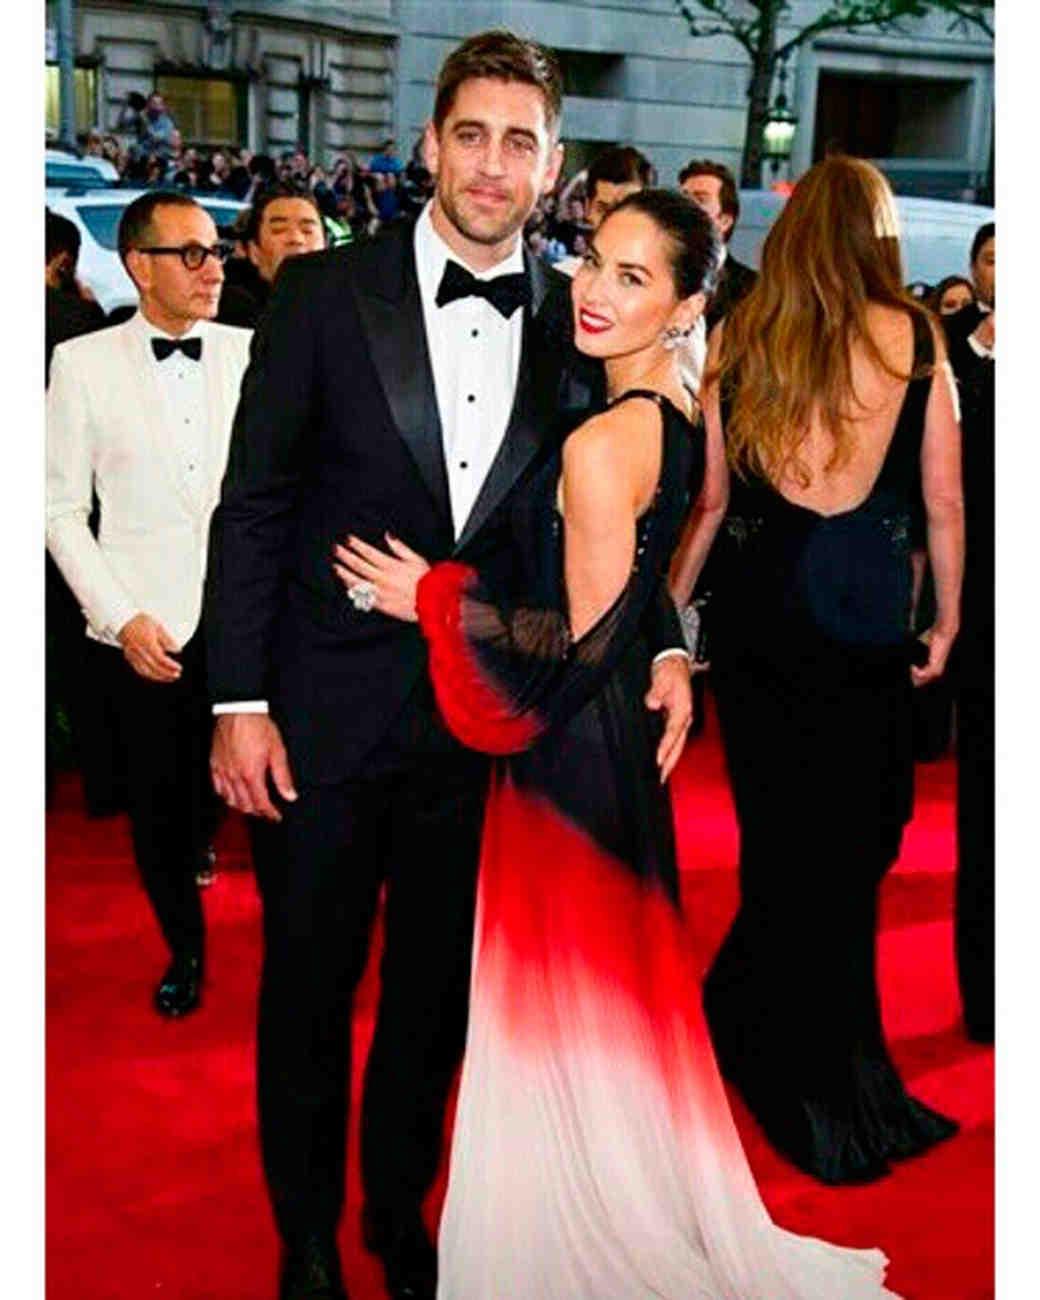 celebrity-couples-we-hope-get-engaged-olivia-munn-aaron-rodgers-1215.jpeg